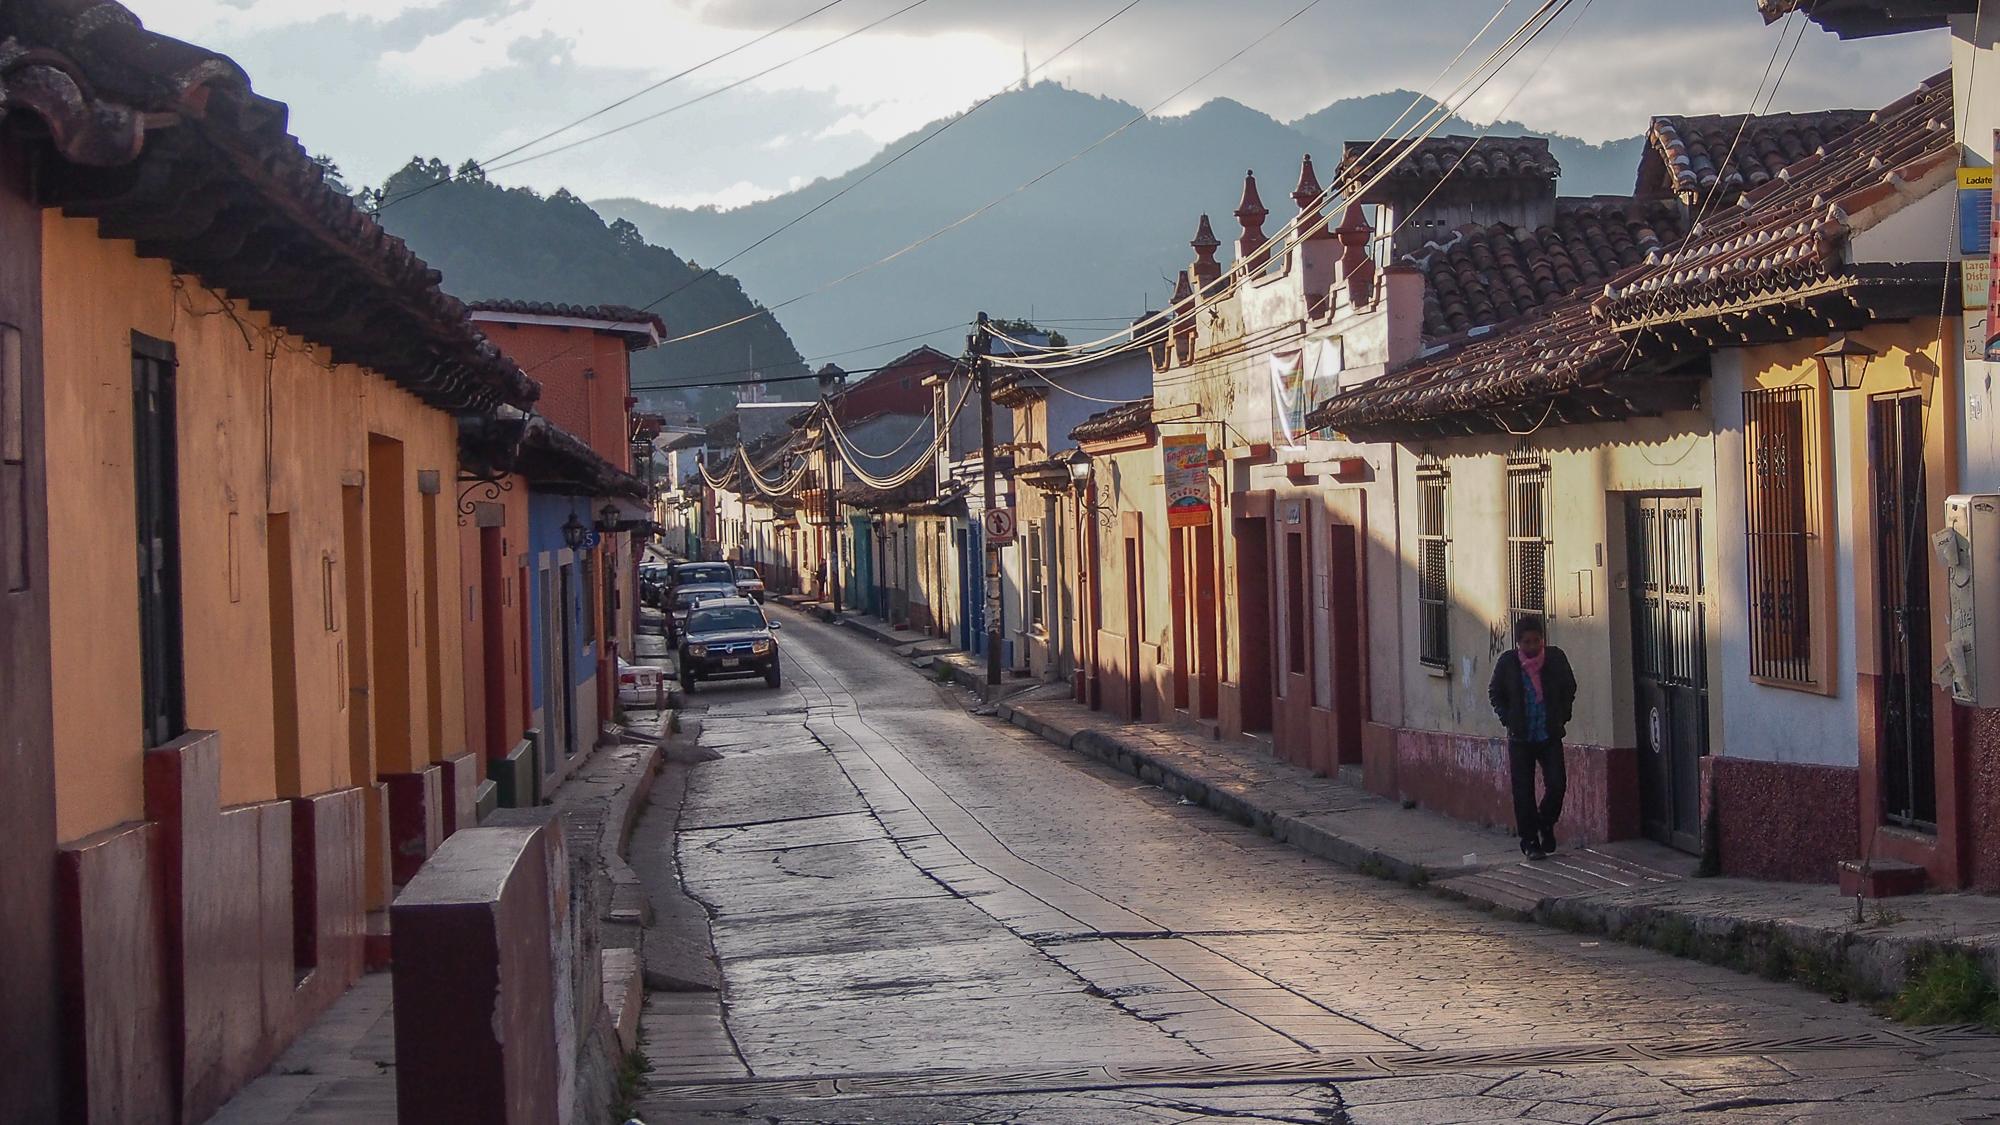 Street of San Cristóbal de las Casas, Mexico